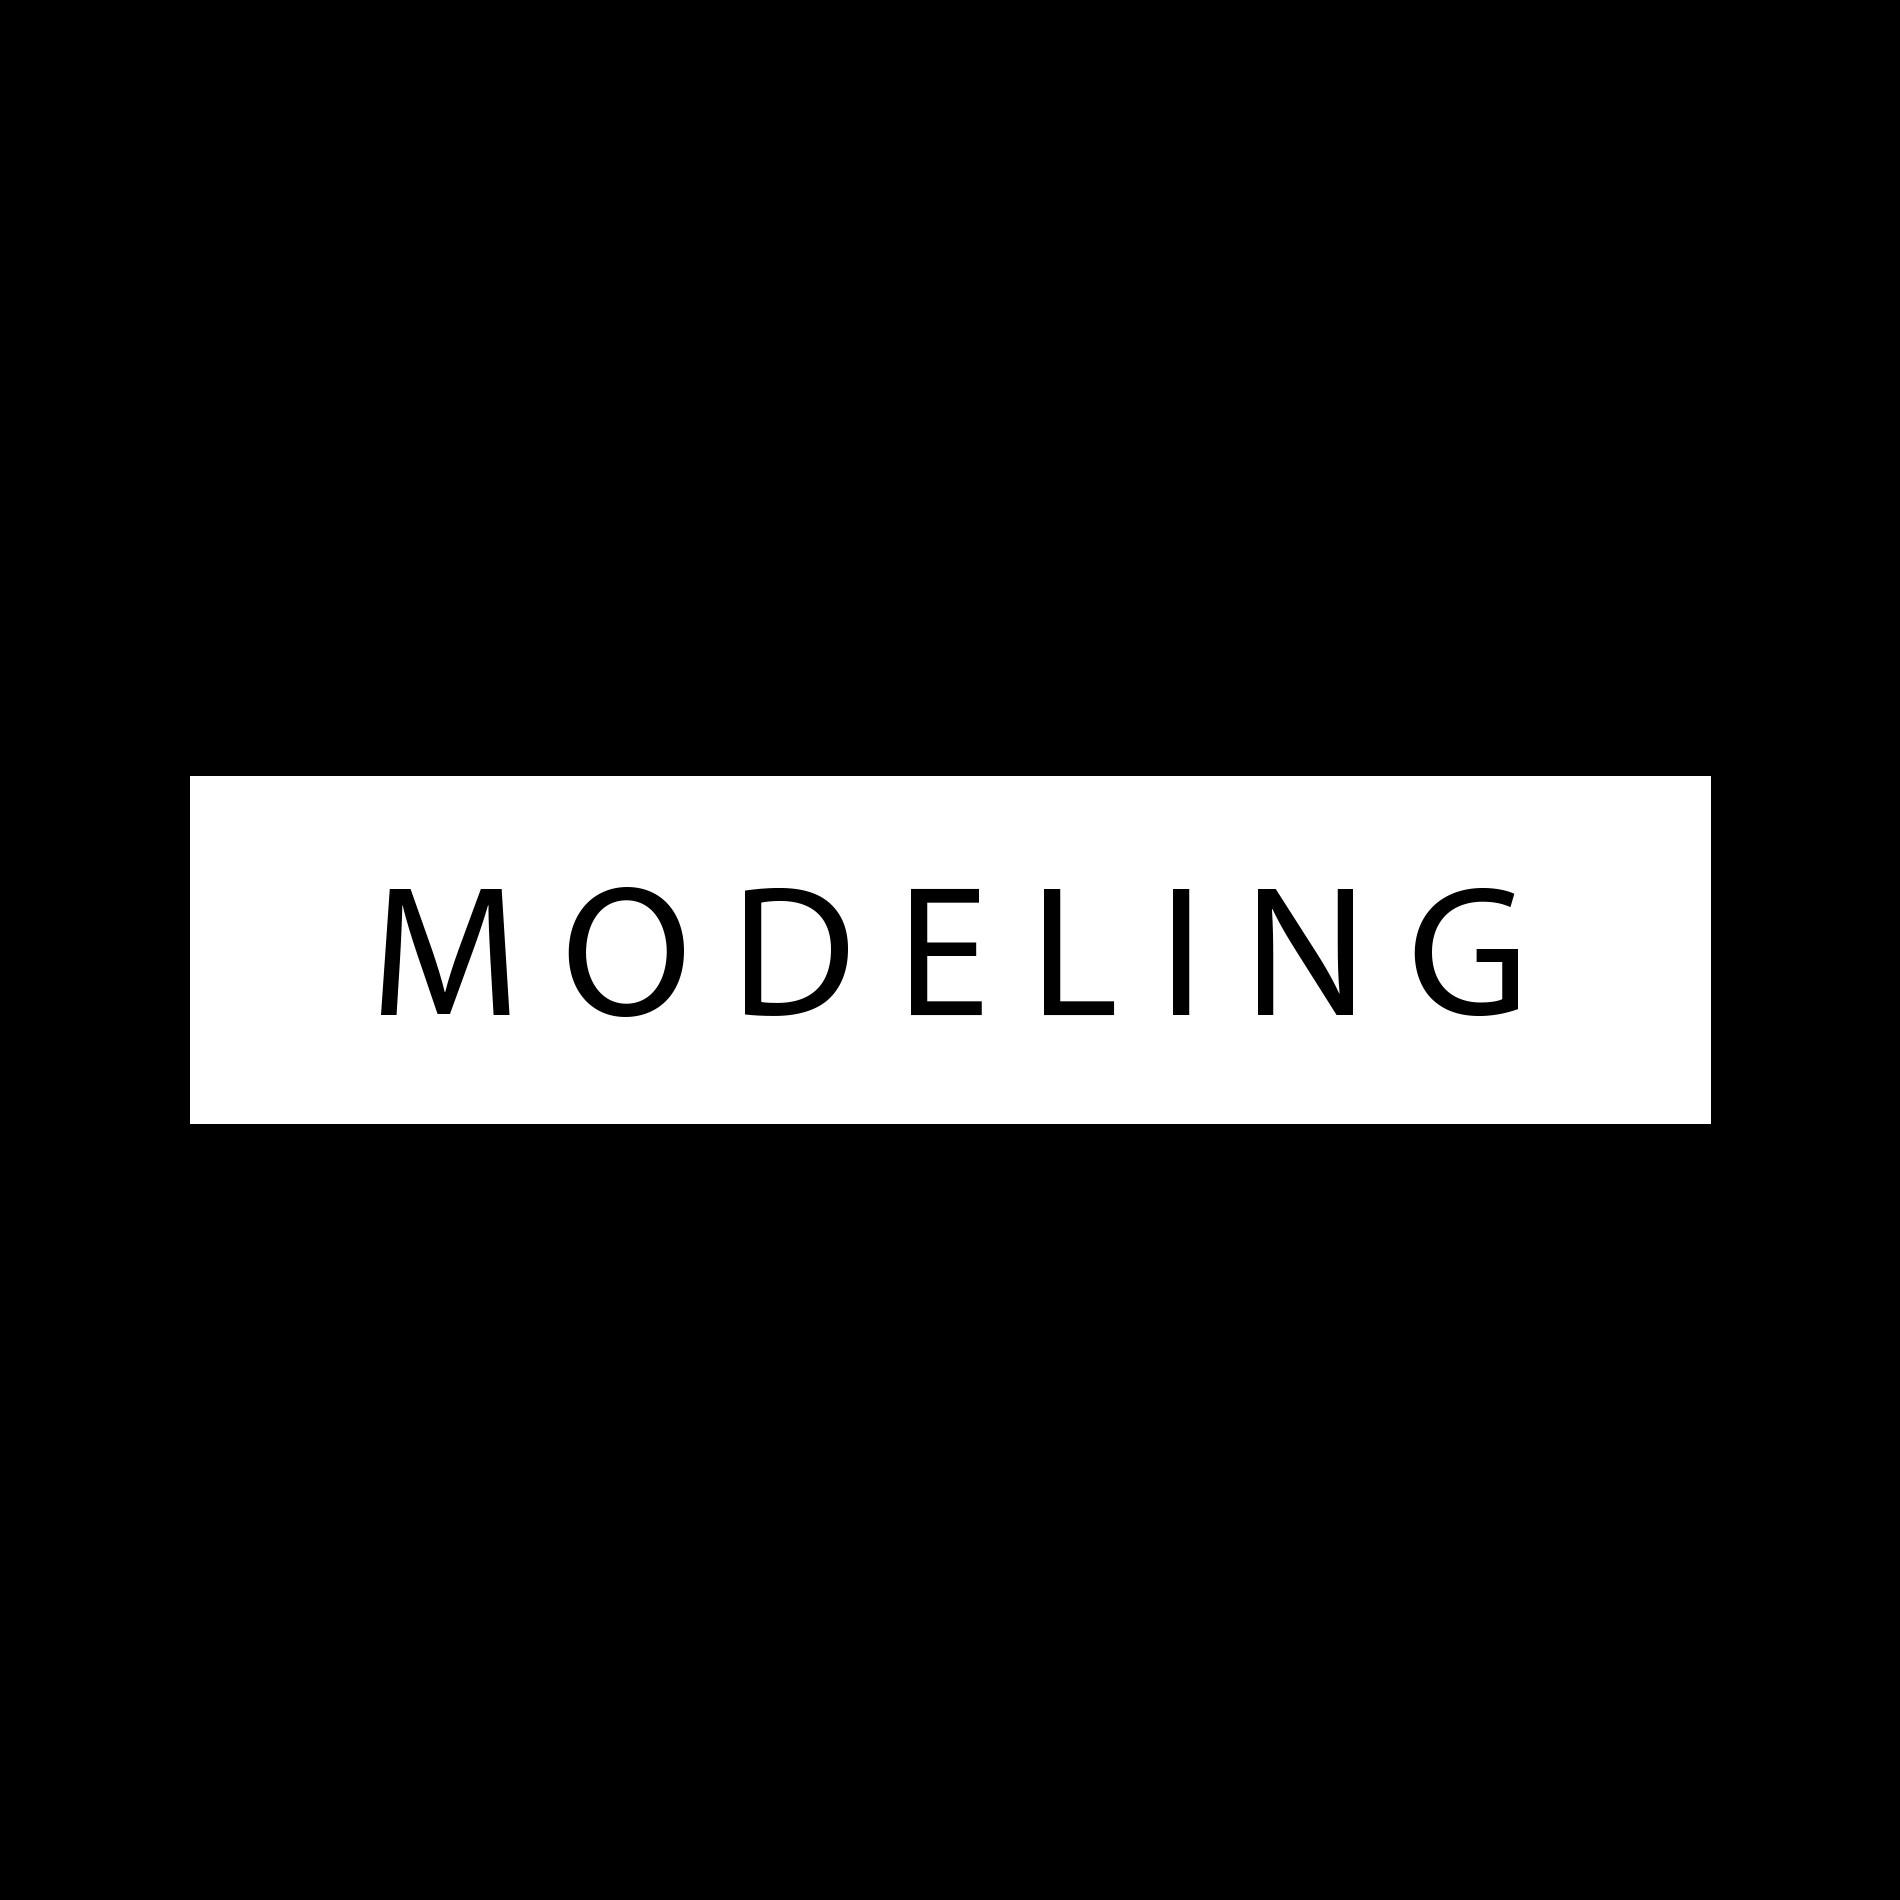 Fabricio rezende modeling